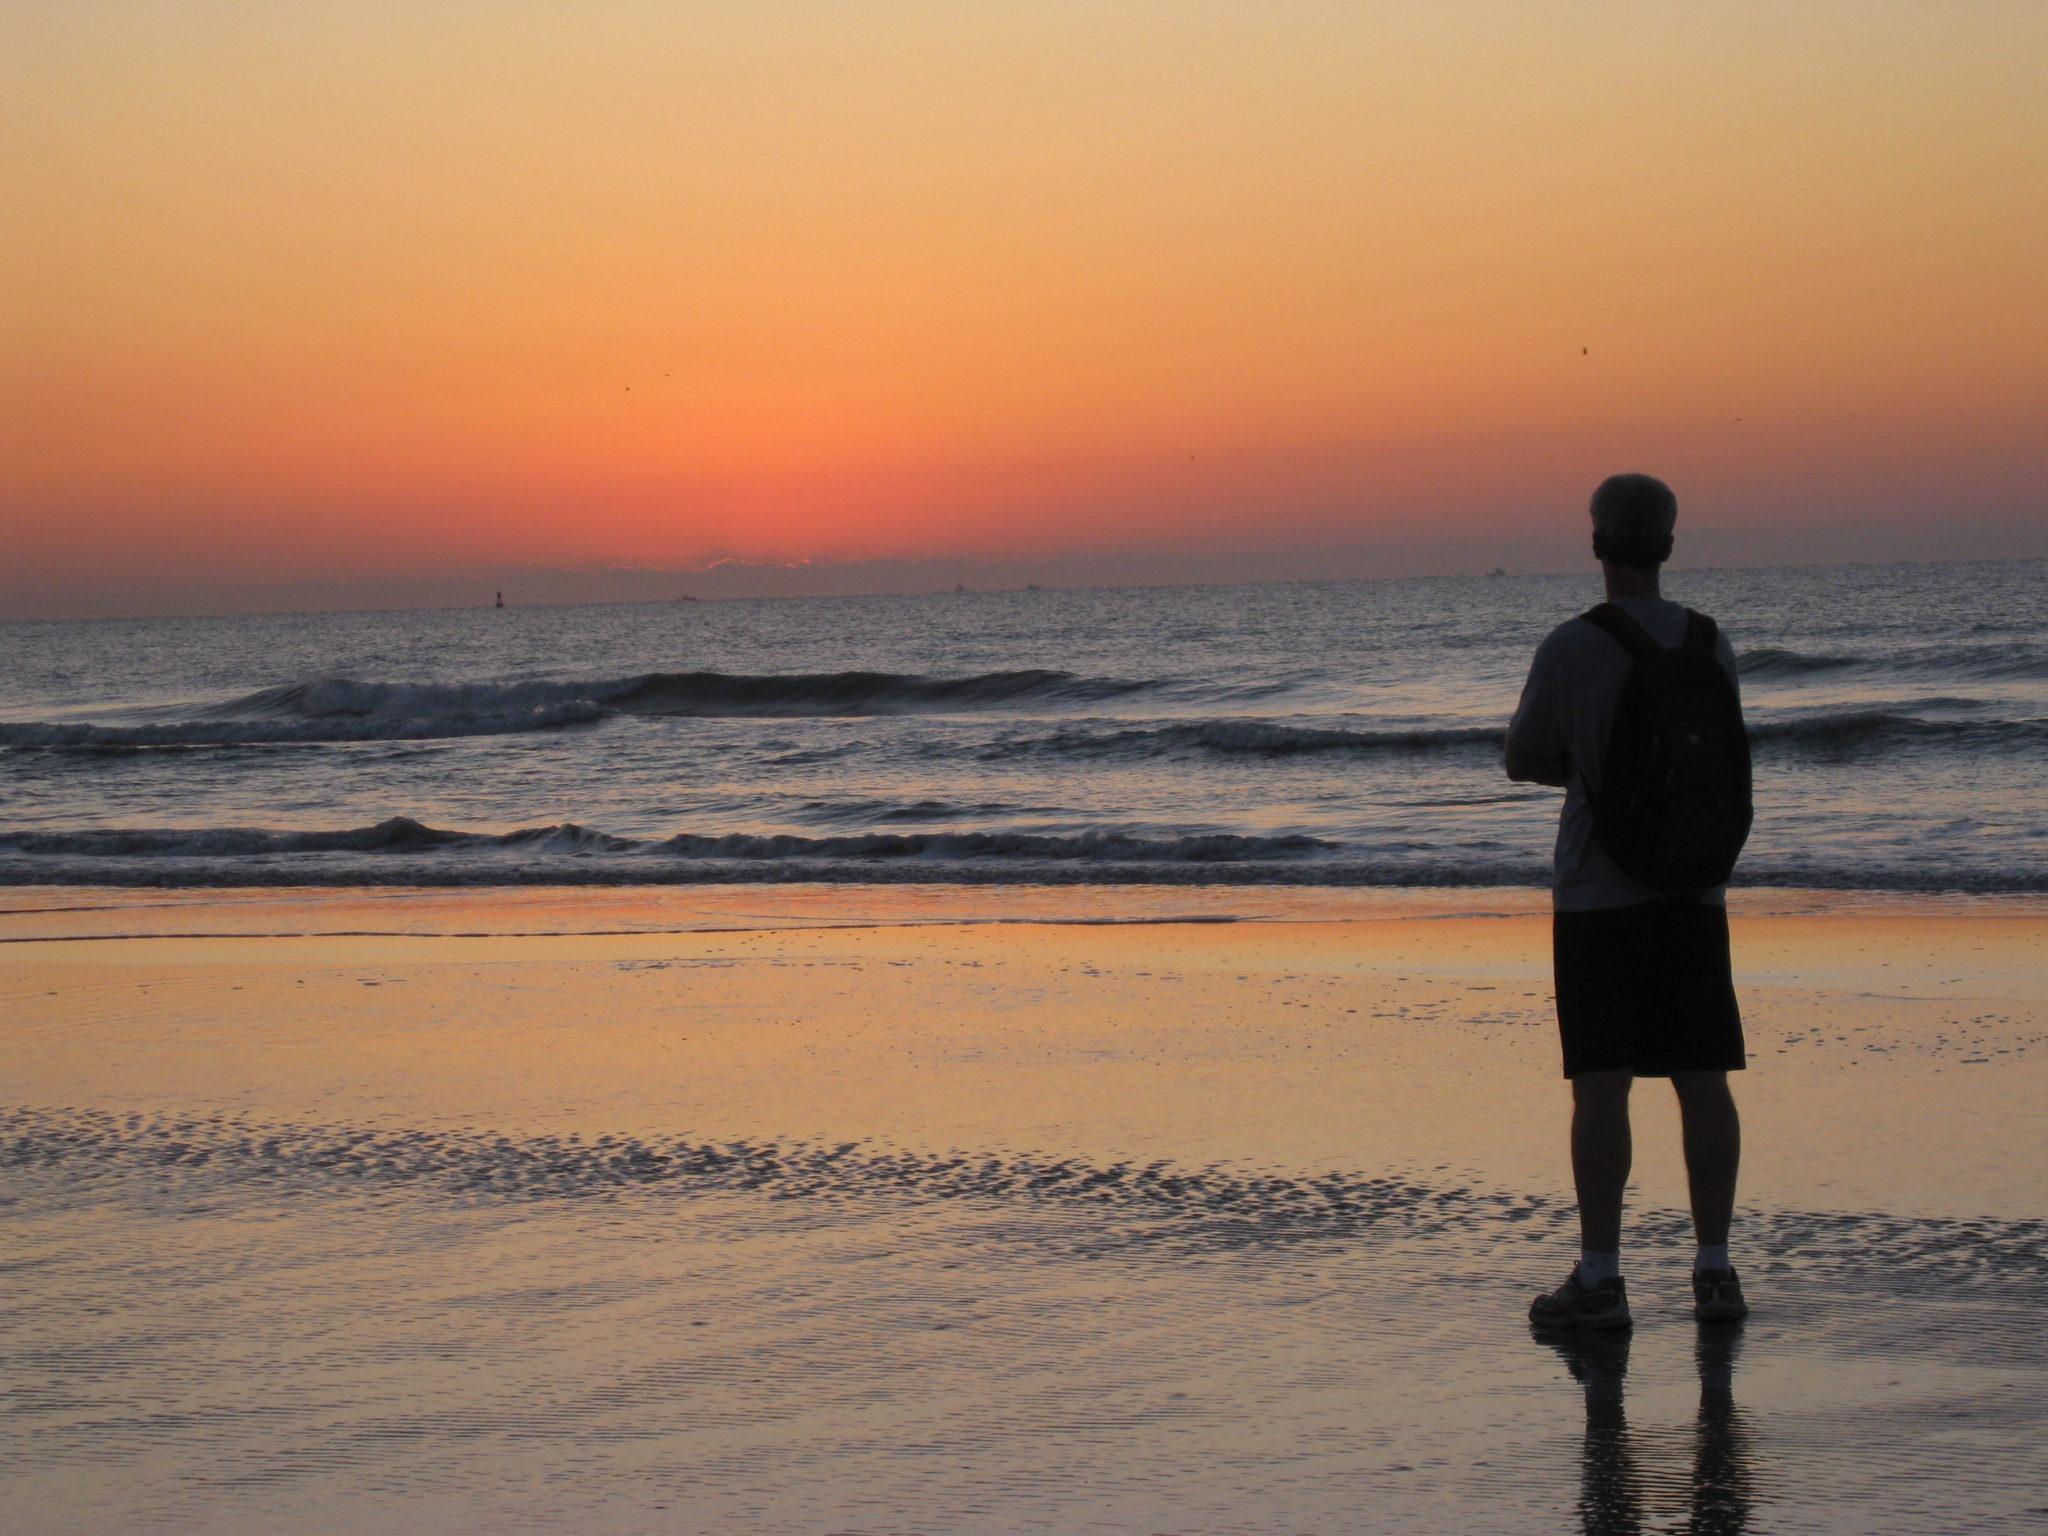 Sunrise in Cape Canaveral